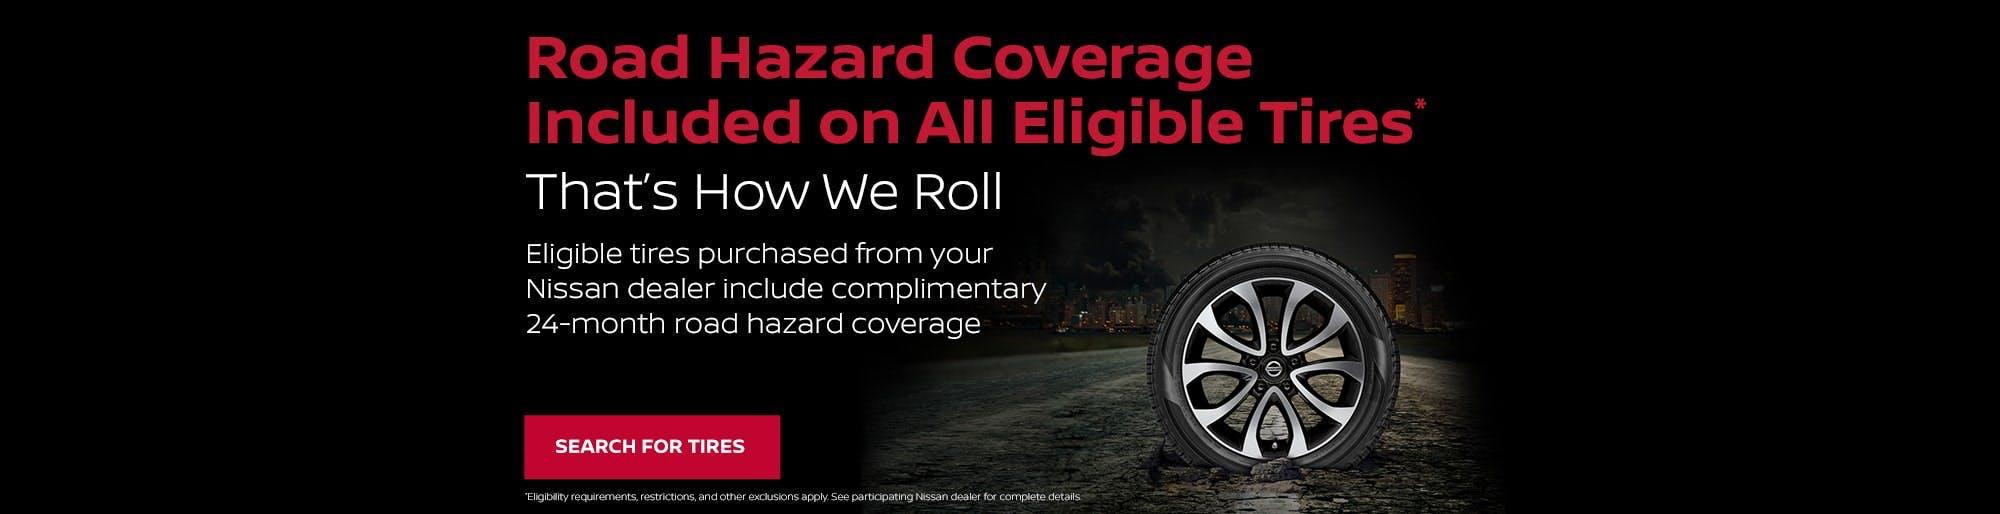 Road Hazard Coverage